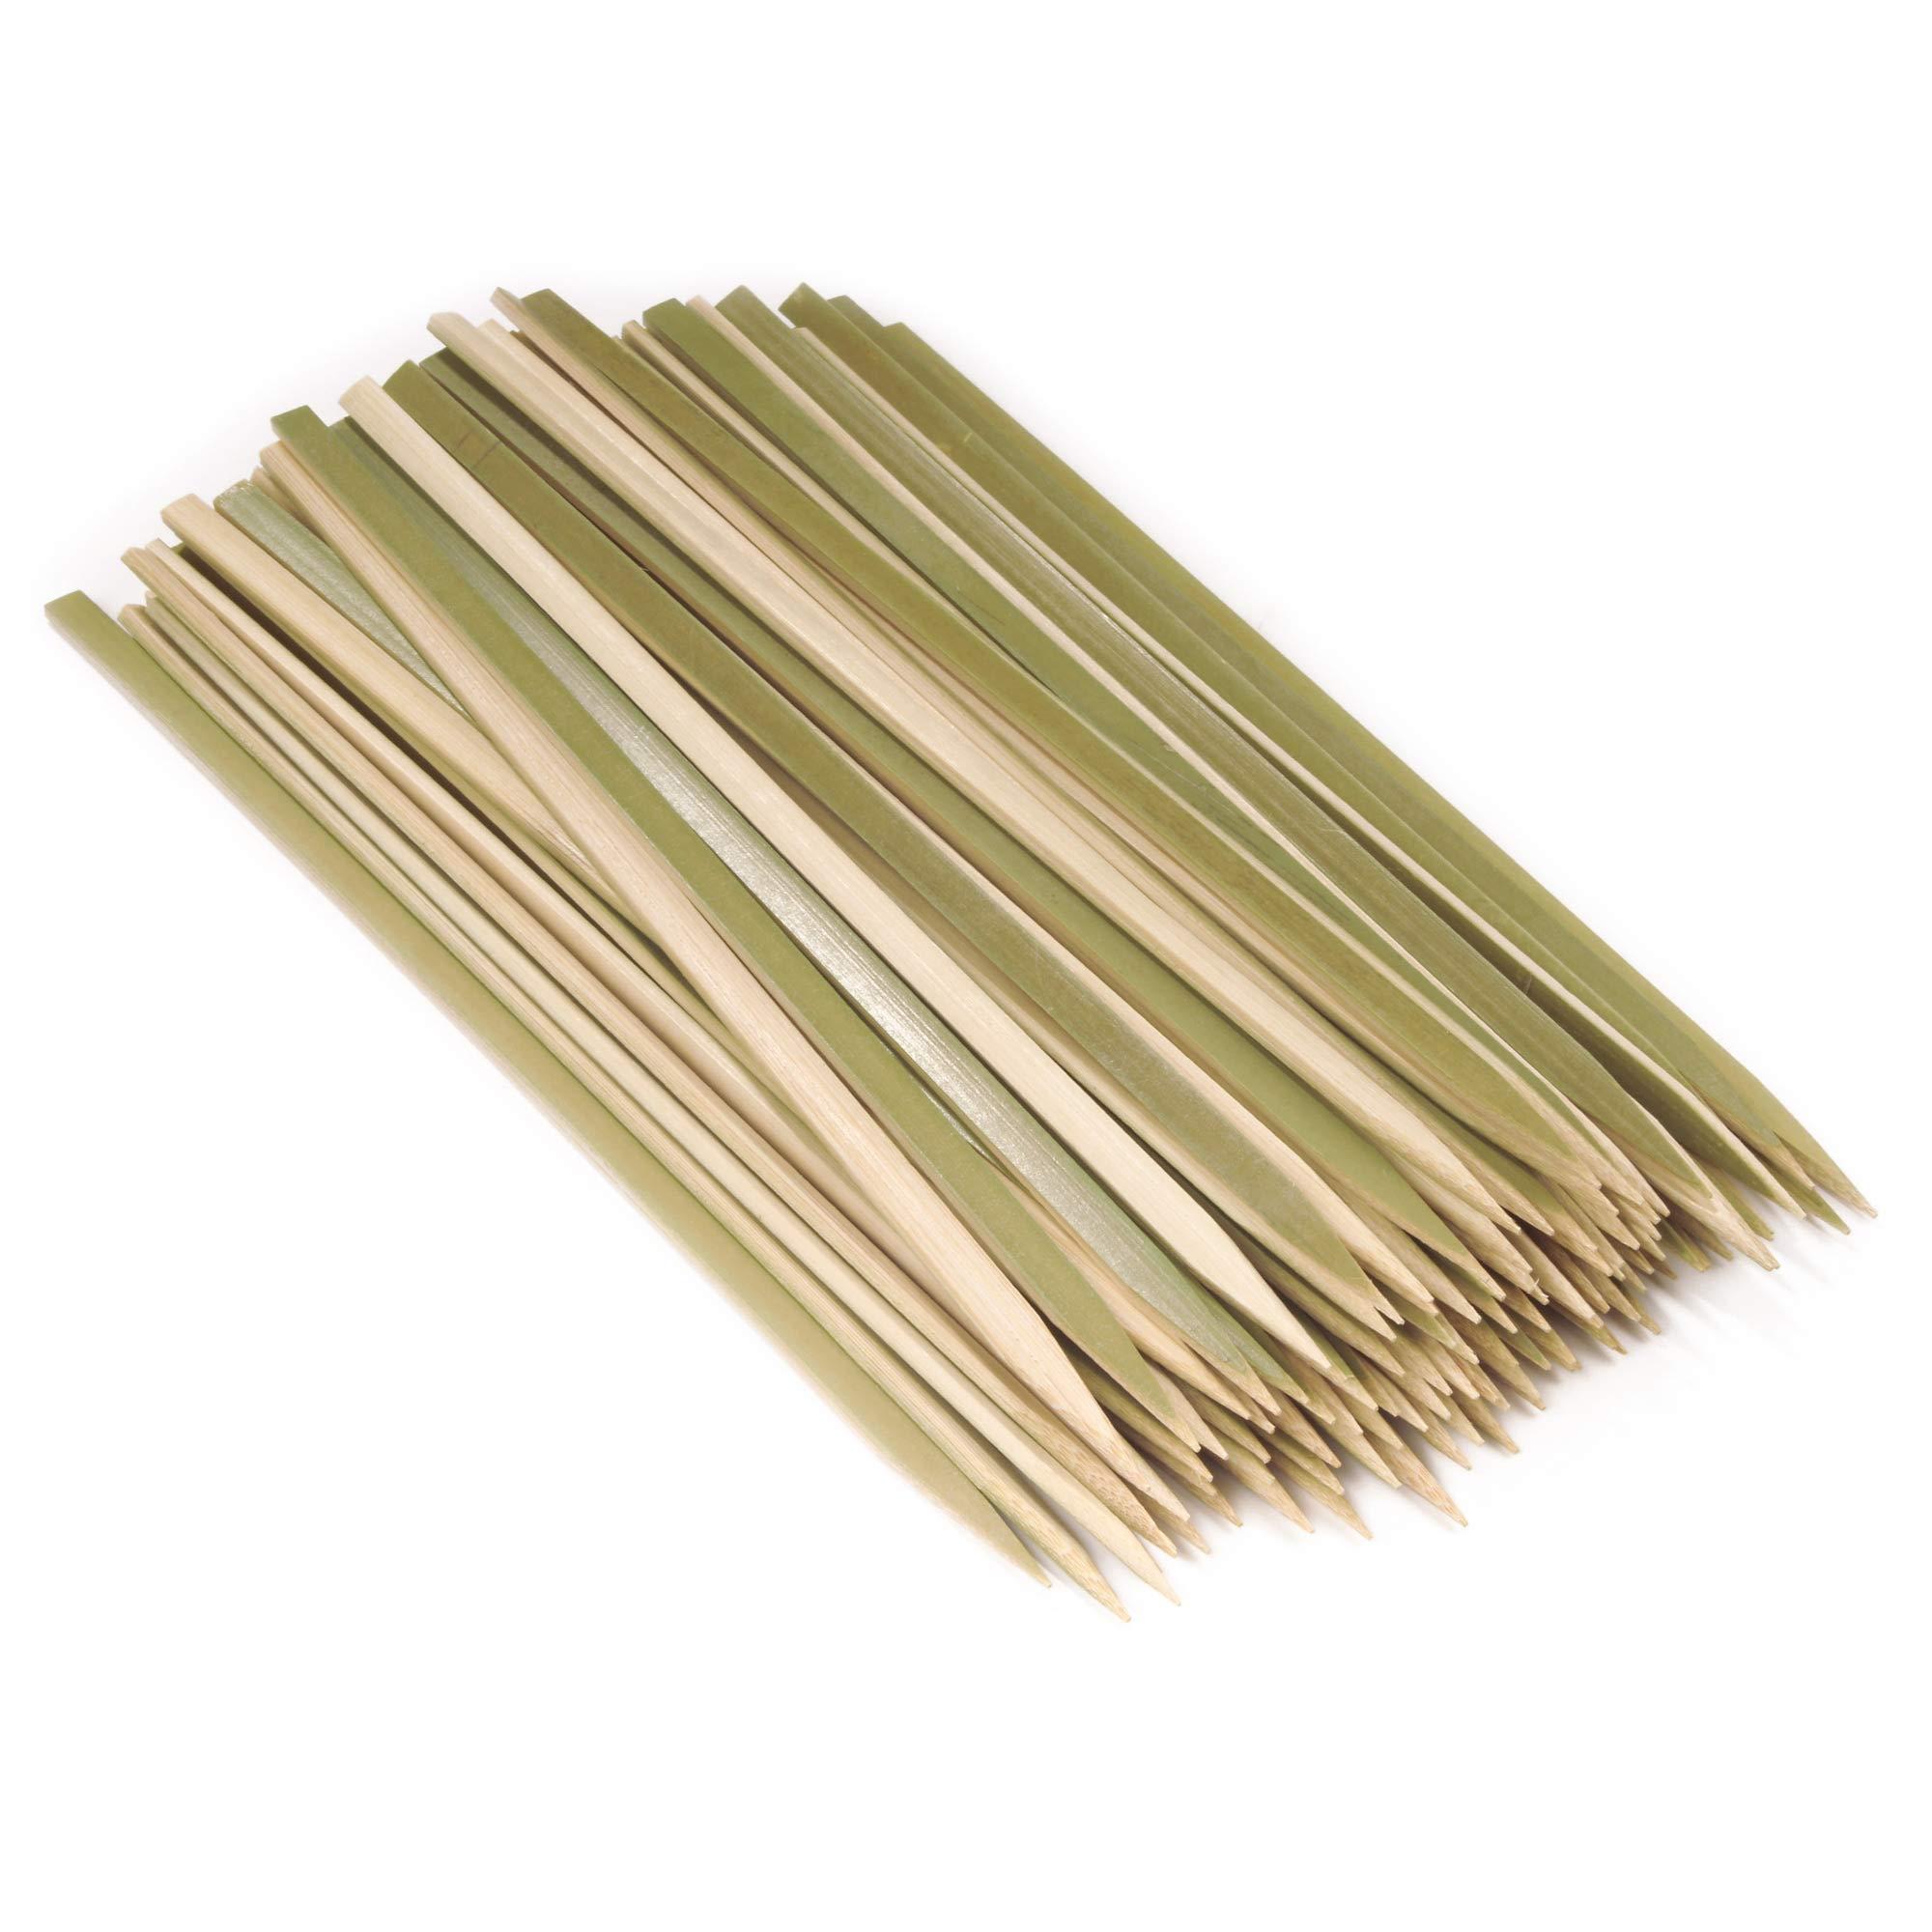 BambooMN Brand - Premium Flat Style Bamboo Wood BBQ Kebab Meat and Fruit Food Skewers, 10'' - 1,000 pcs